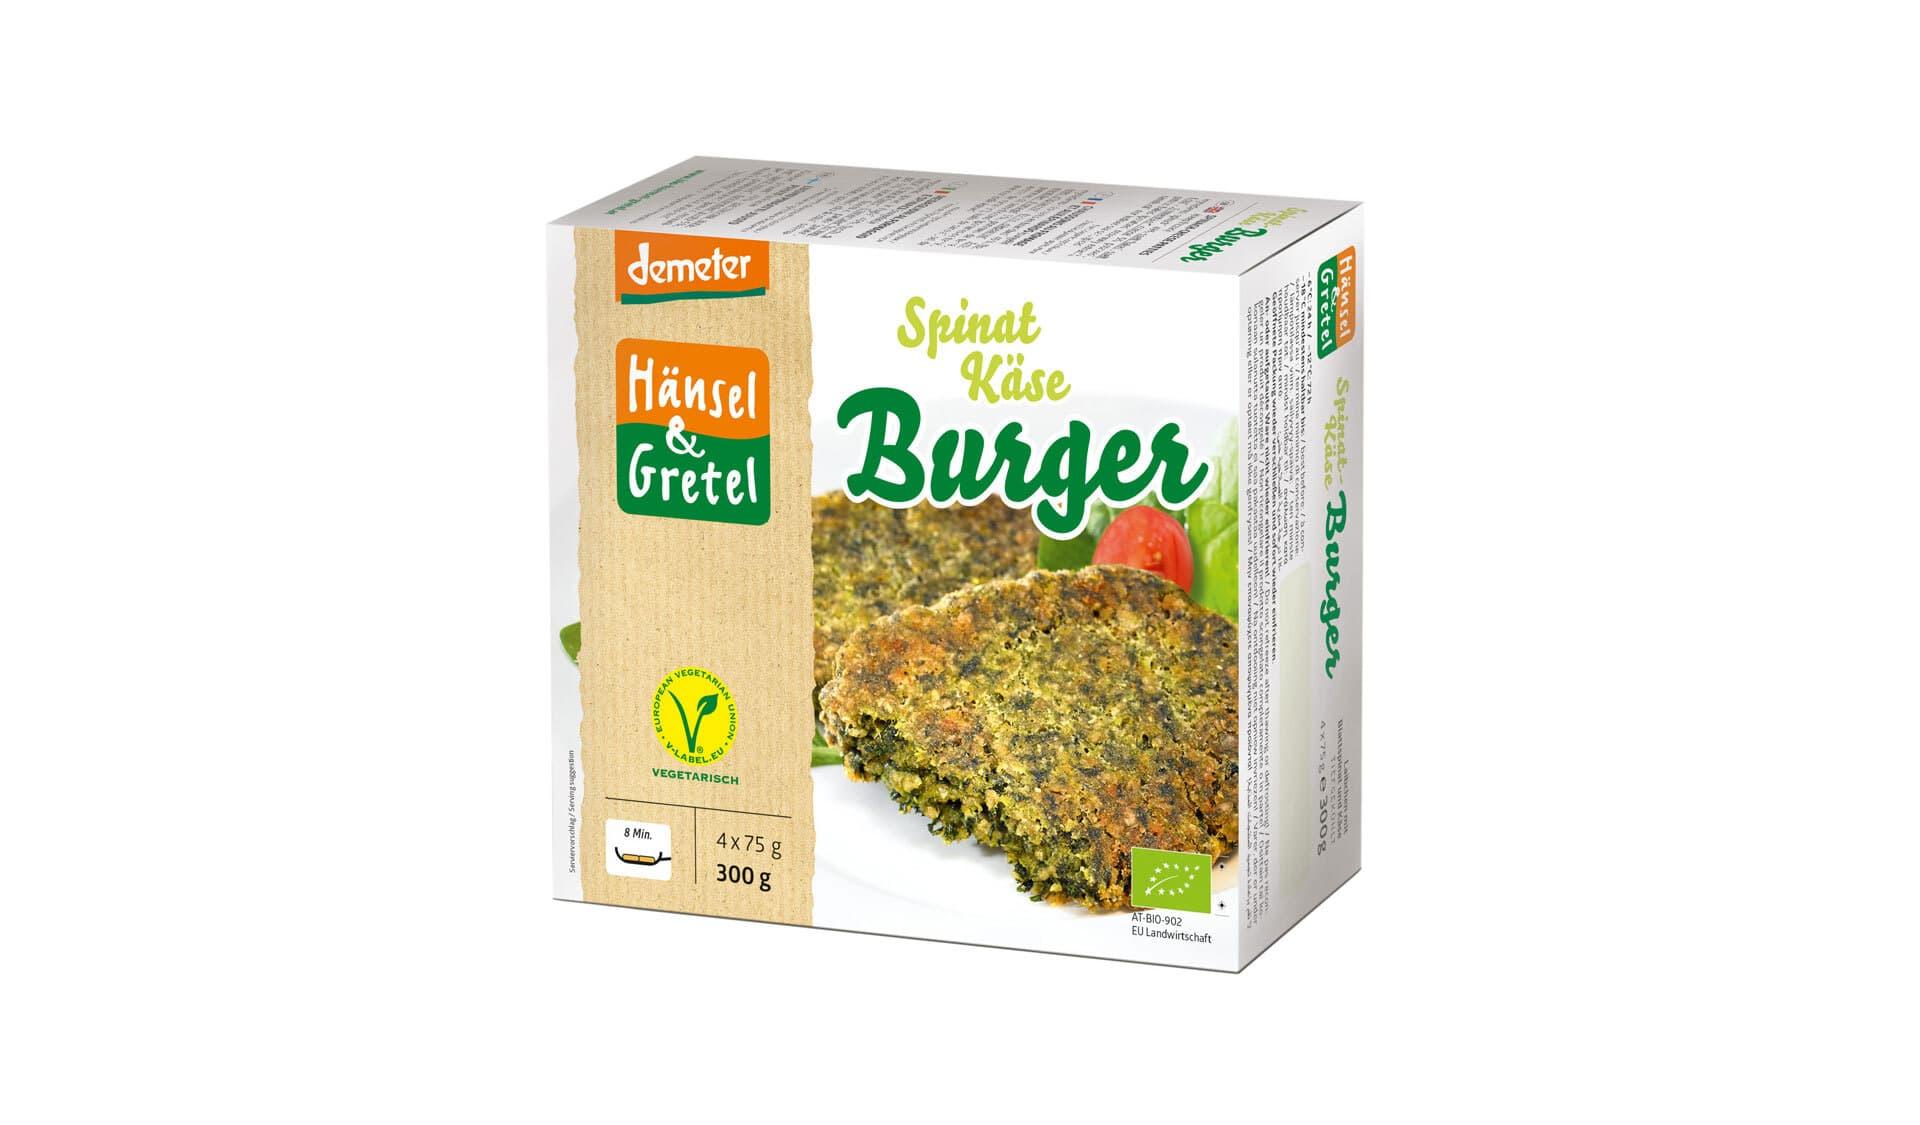 Hänsel & Gretel Spinat Kaese Burger